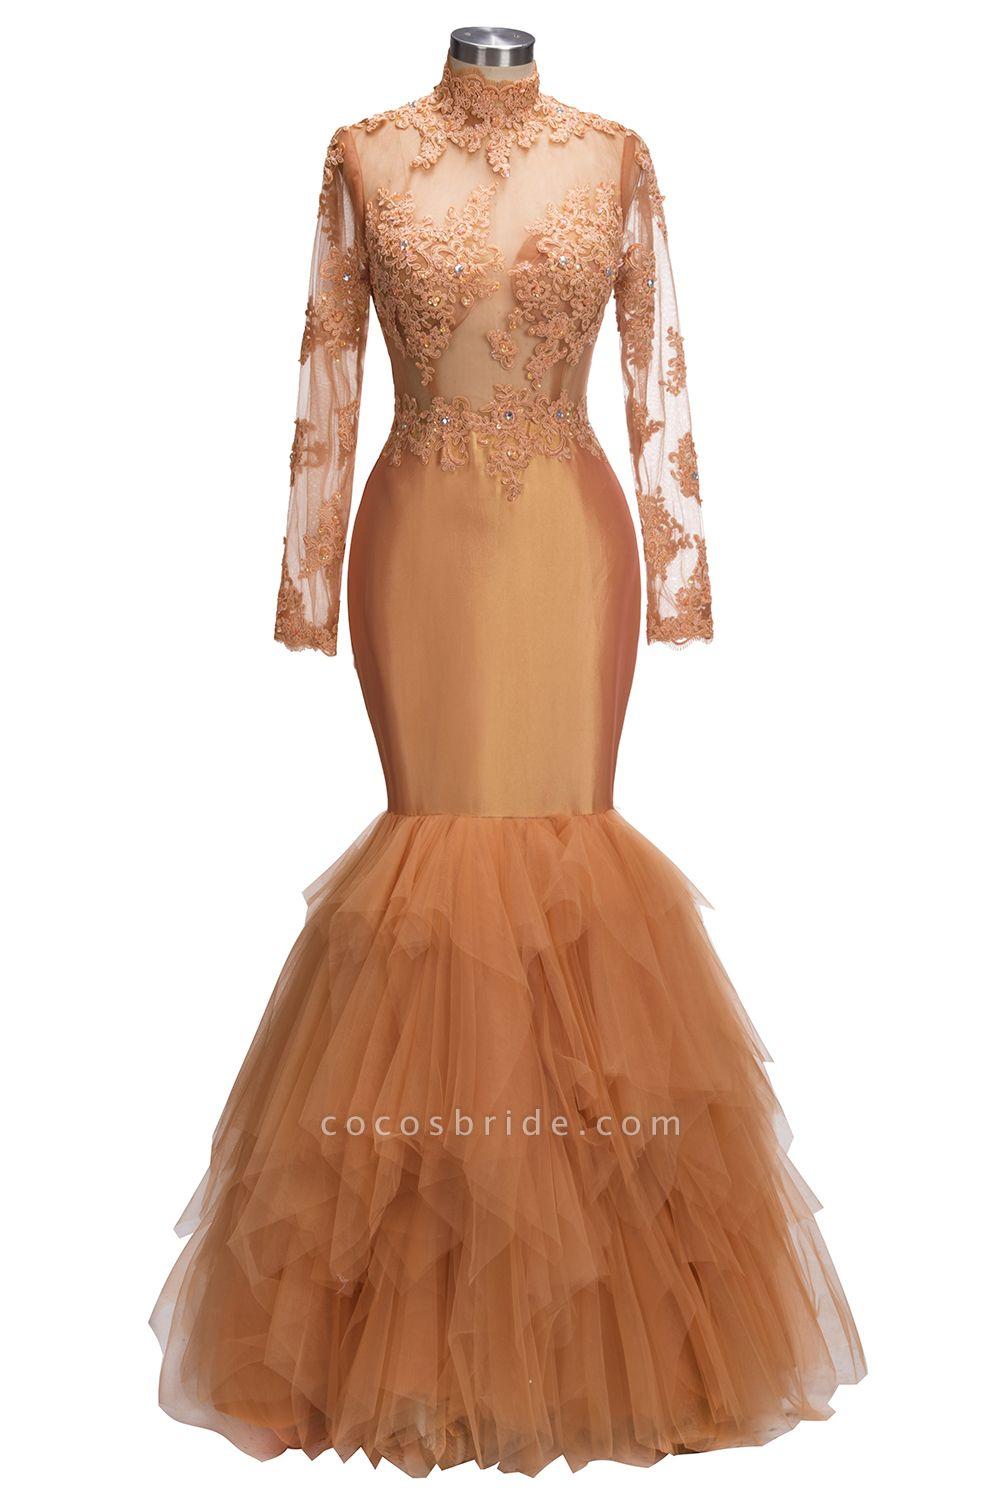 SELENA   Mermaid High Neck Long Appliques Sheer Prom Dresses